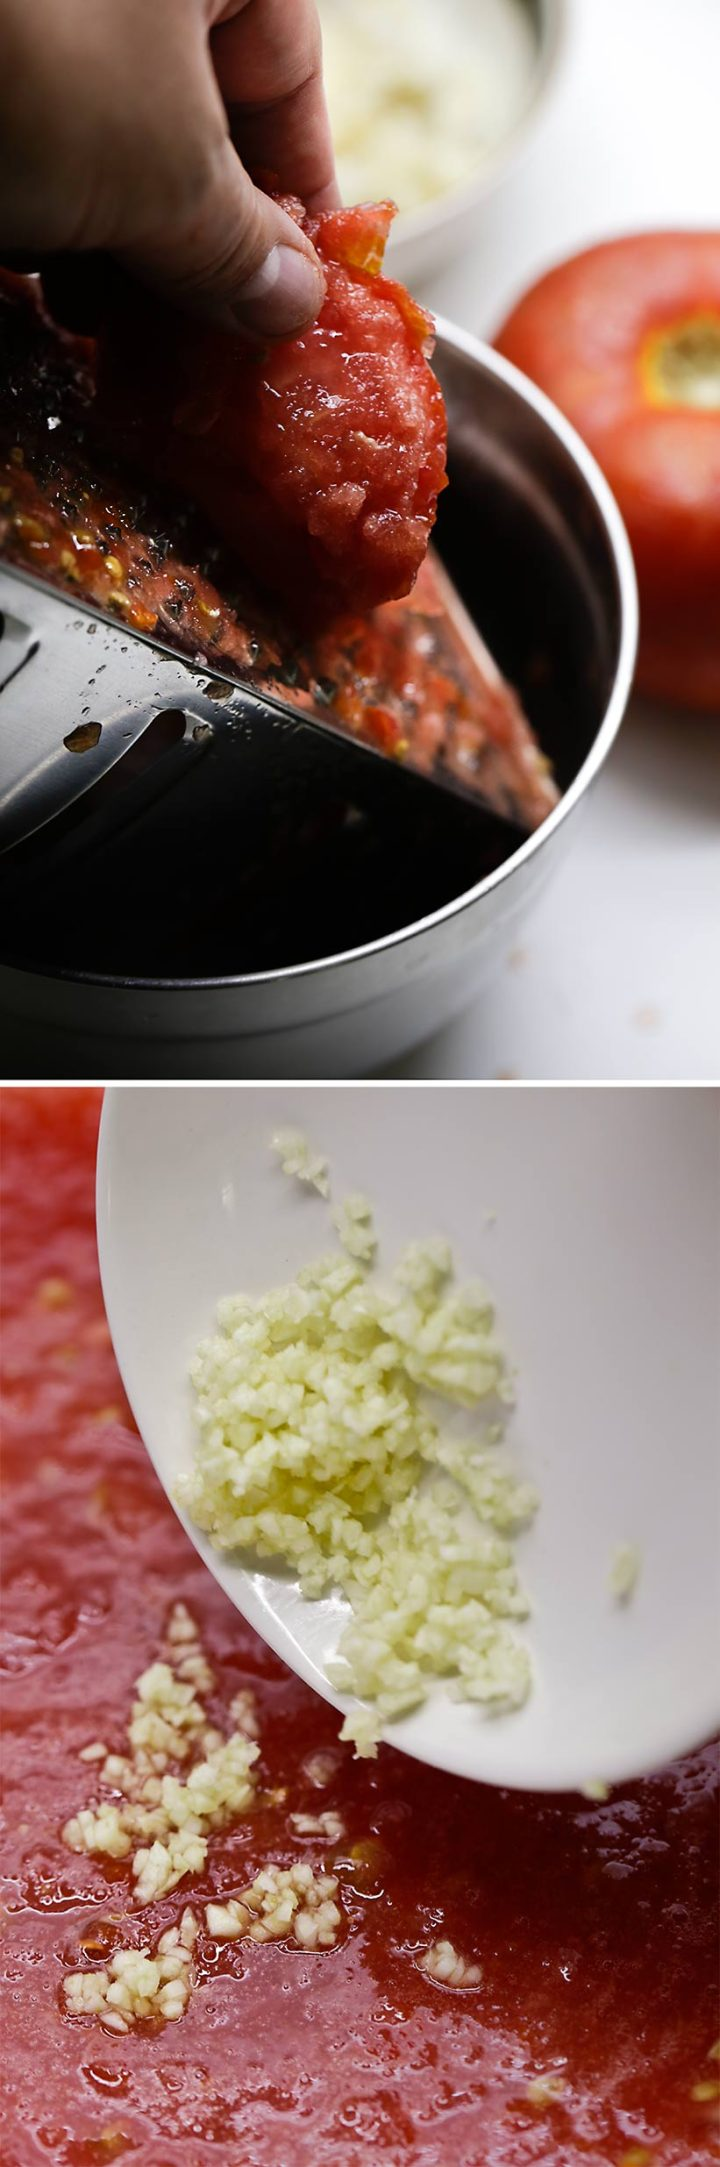 Receta de capellán con tomate 10